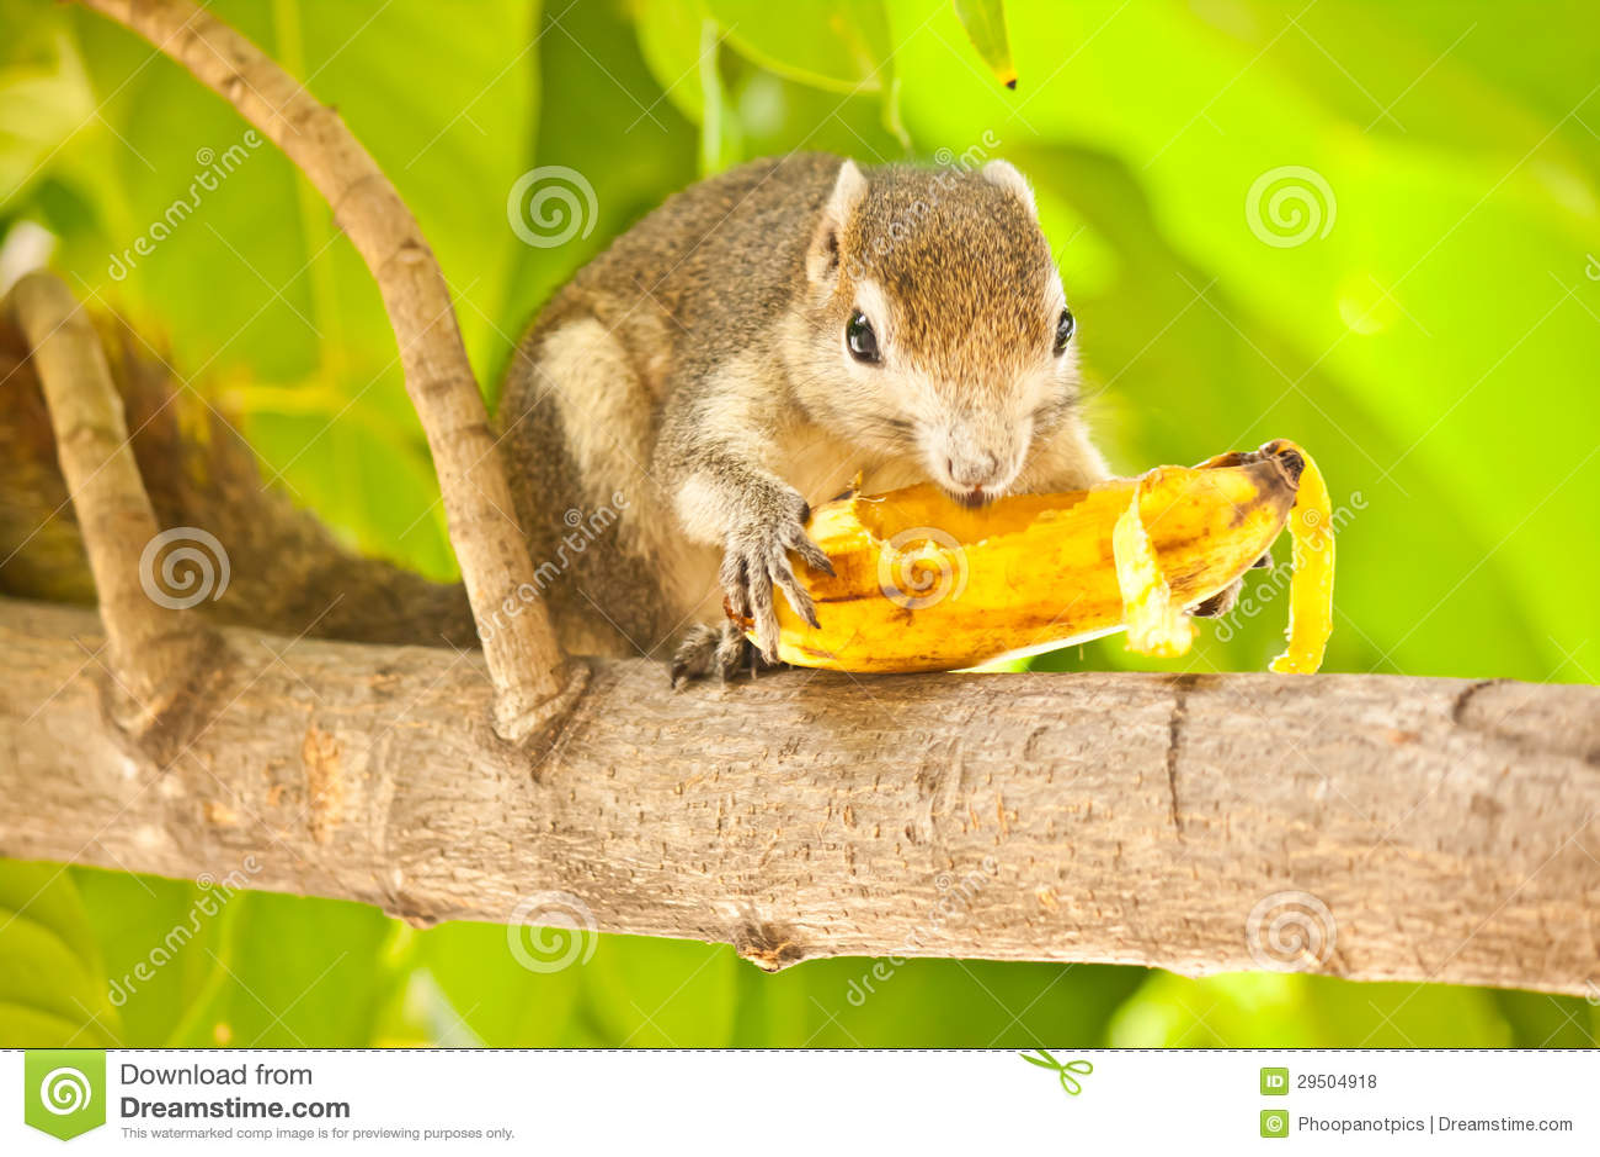 Eekhoorn die banaan eten